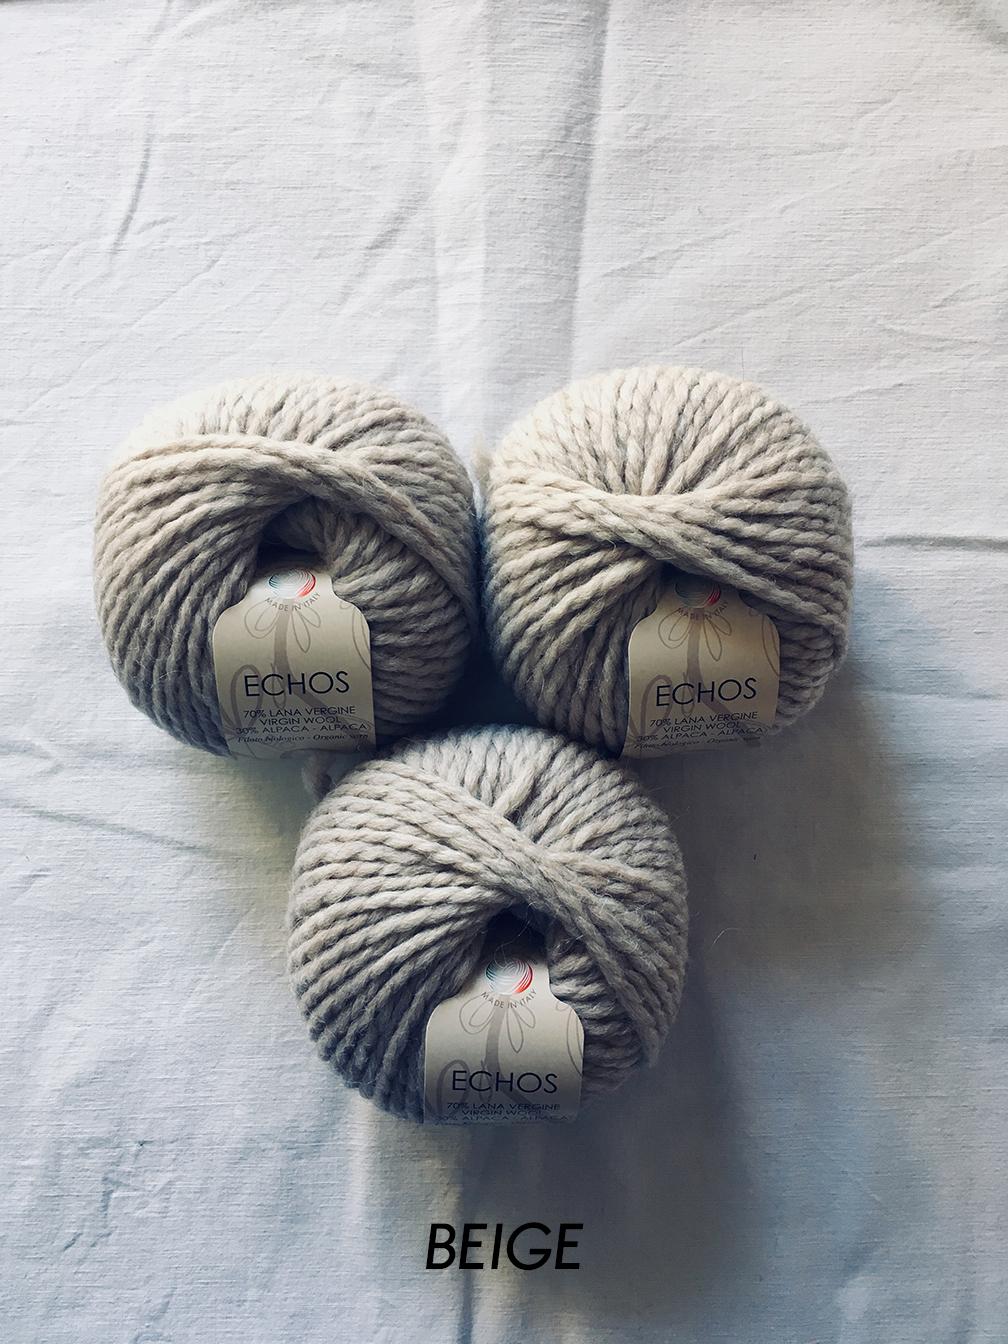 sesia_echos_beige_1494_wool_done_knitting.jpg